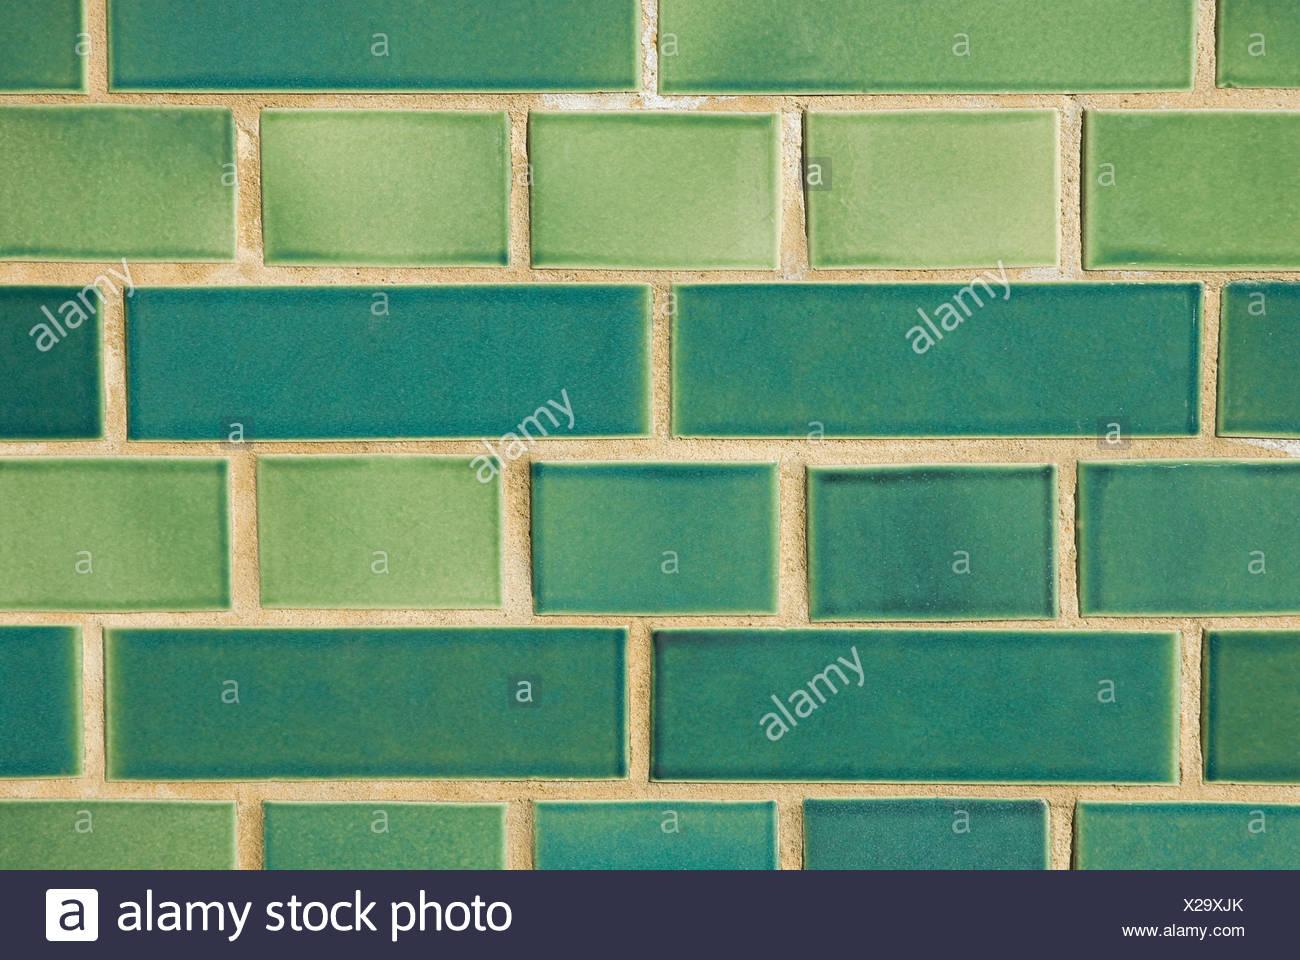 Green tiles - Stock Image